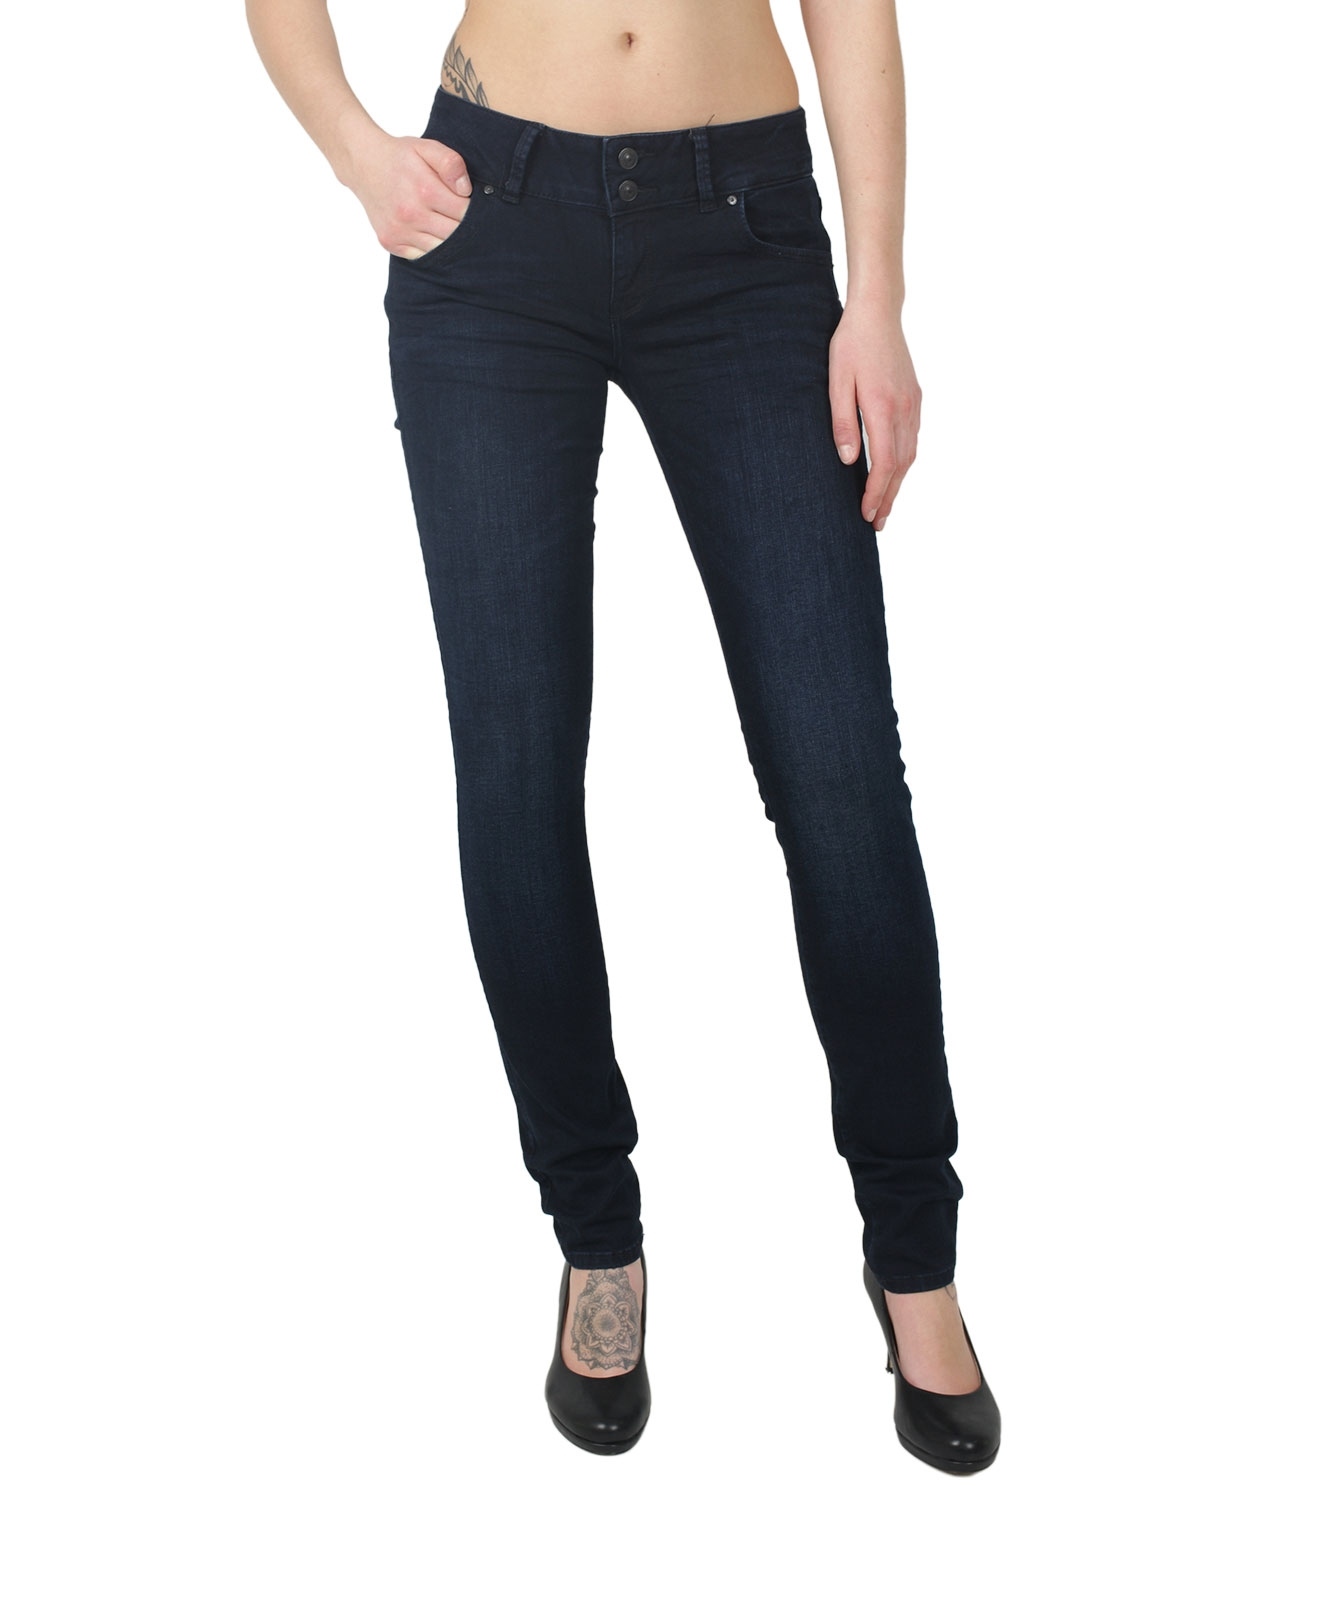 Hosen - LTB Jeans Röhre Molly in Coliann Wash  - Onlineshop Jeans Meile